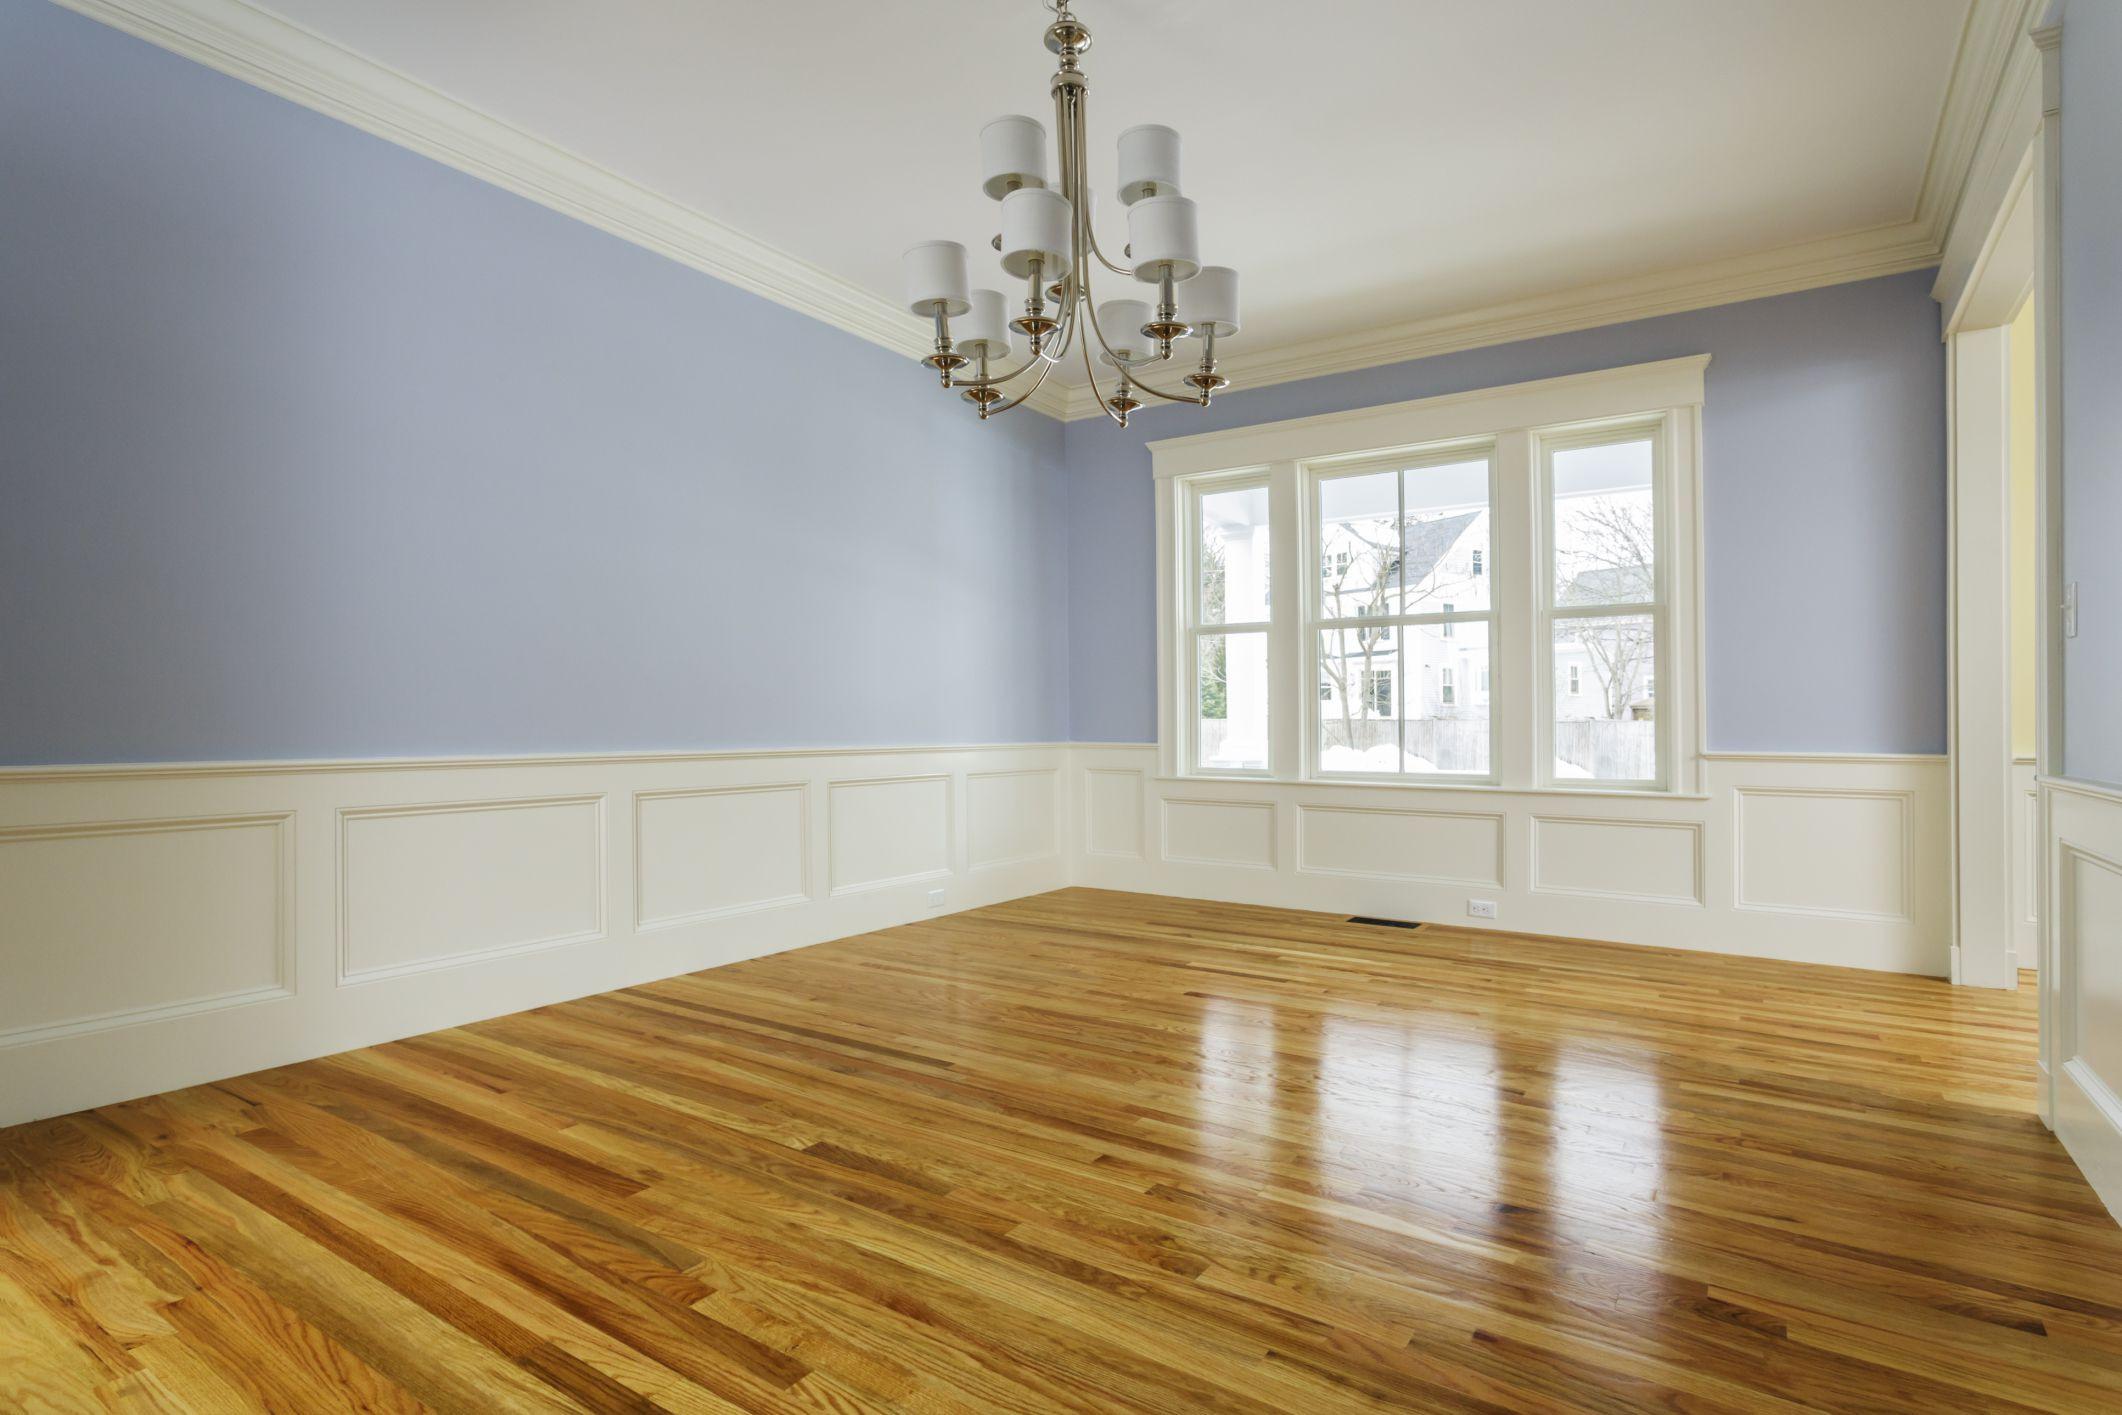 resurfacing prefinished hardwood floors of the cost to refinish hardwood floors in 168686572 highres 56a2fd773df78cf7727b6cb3